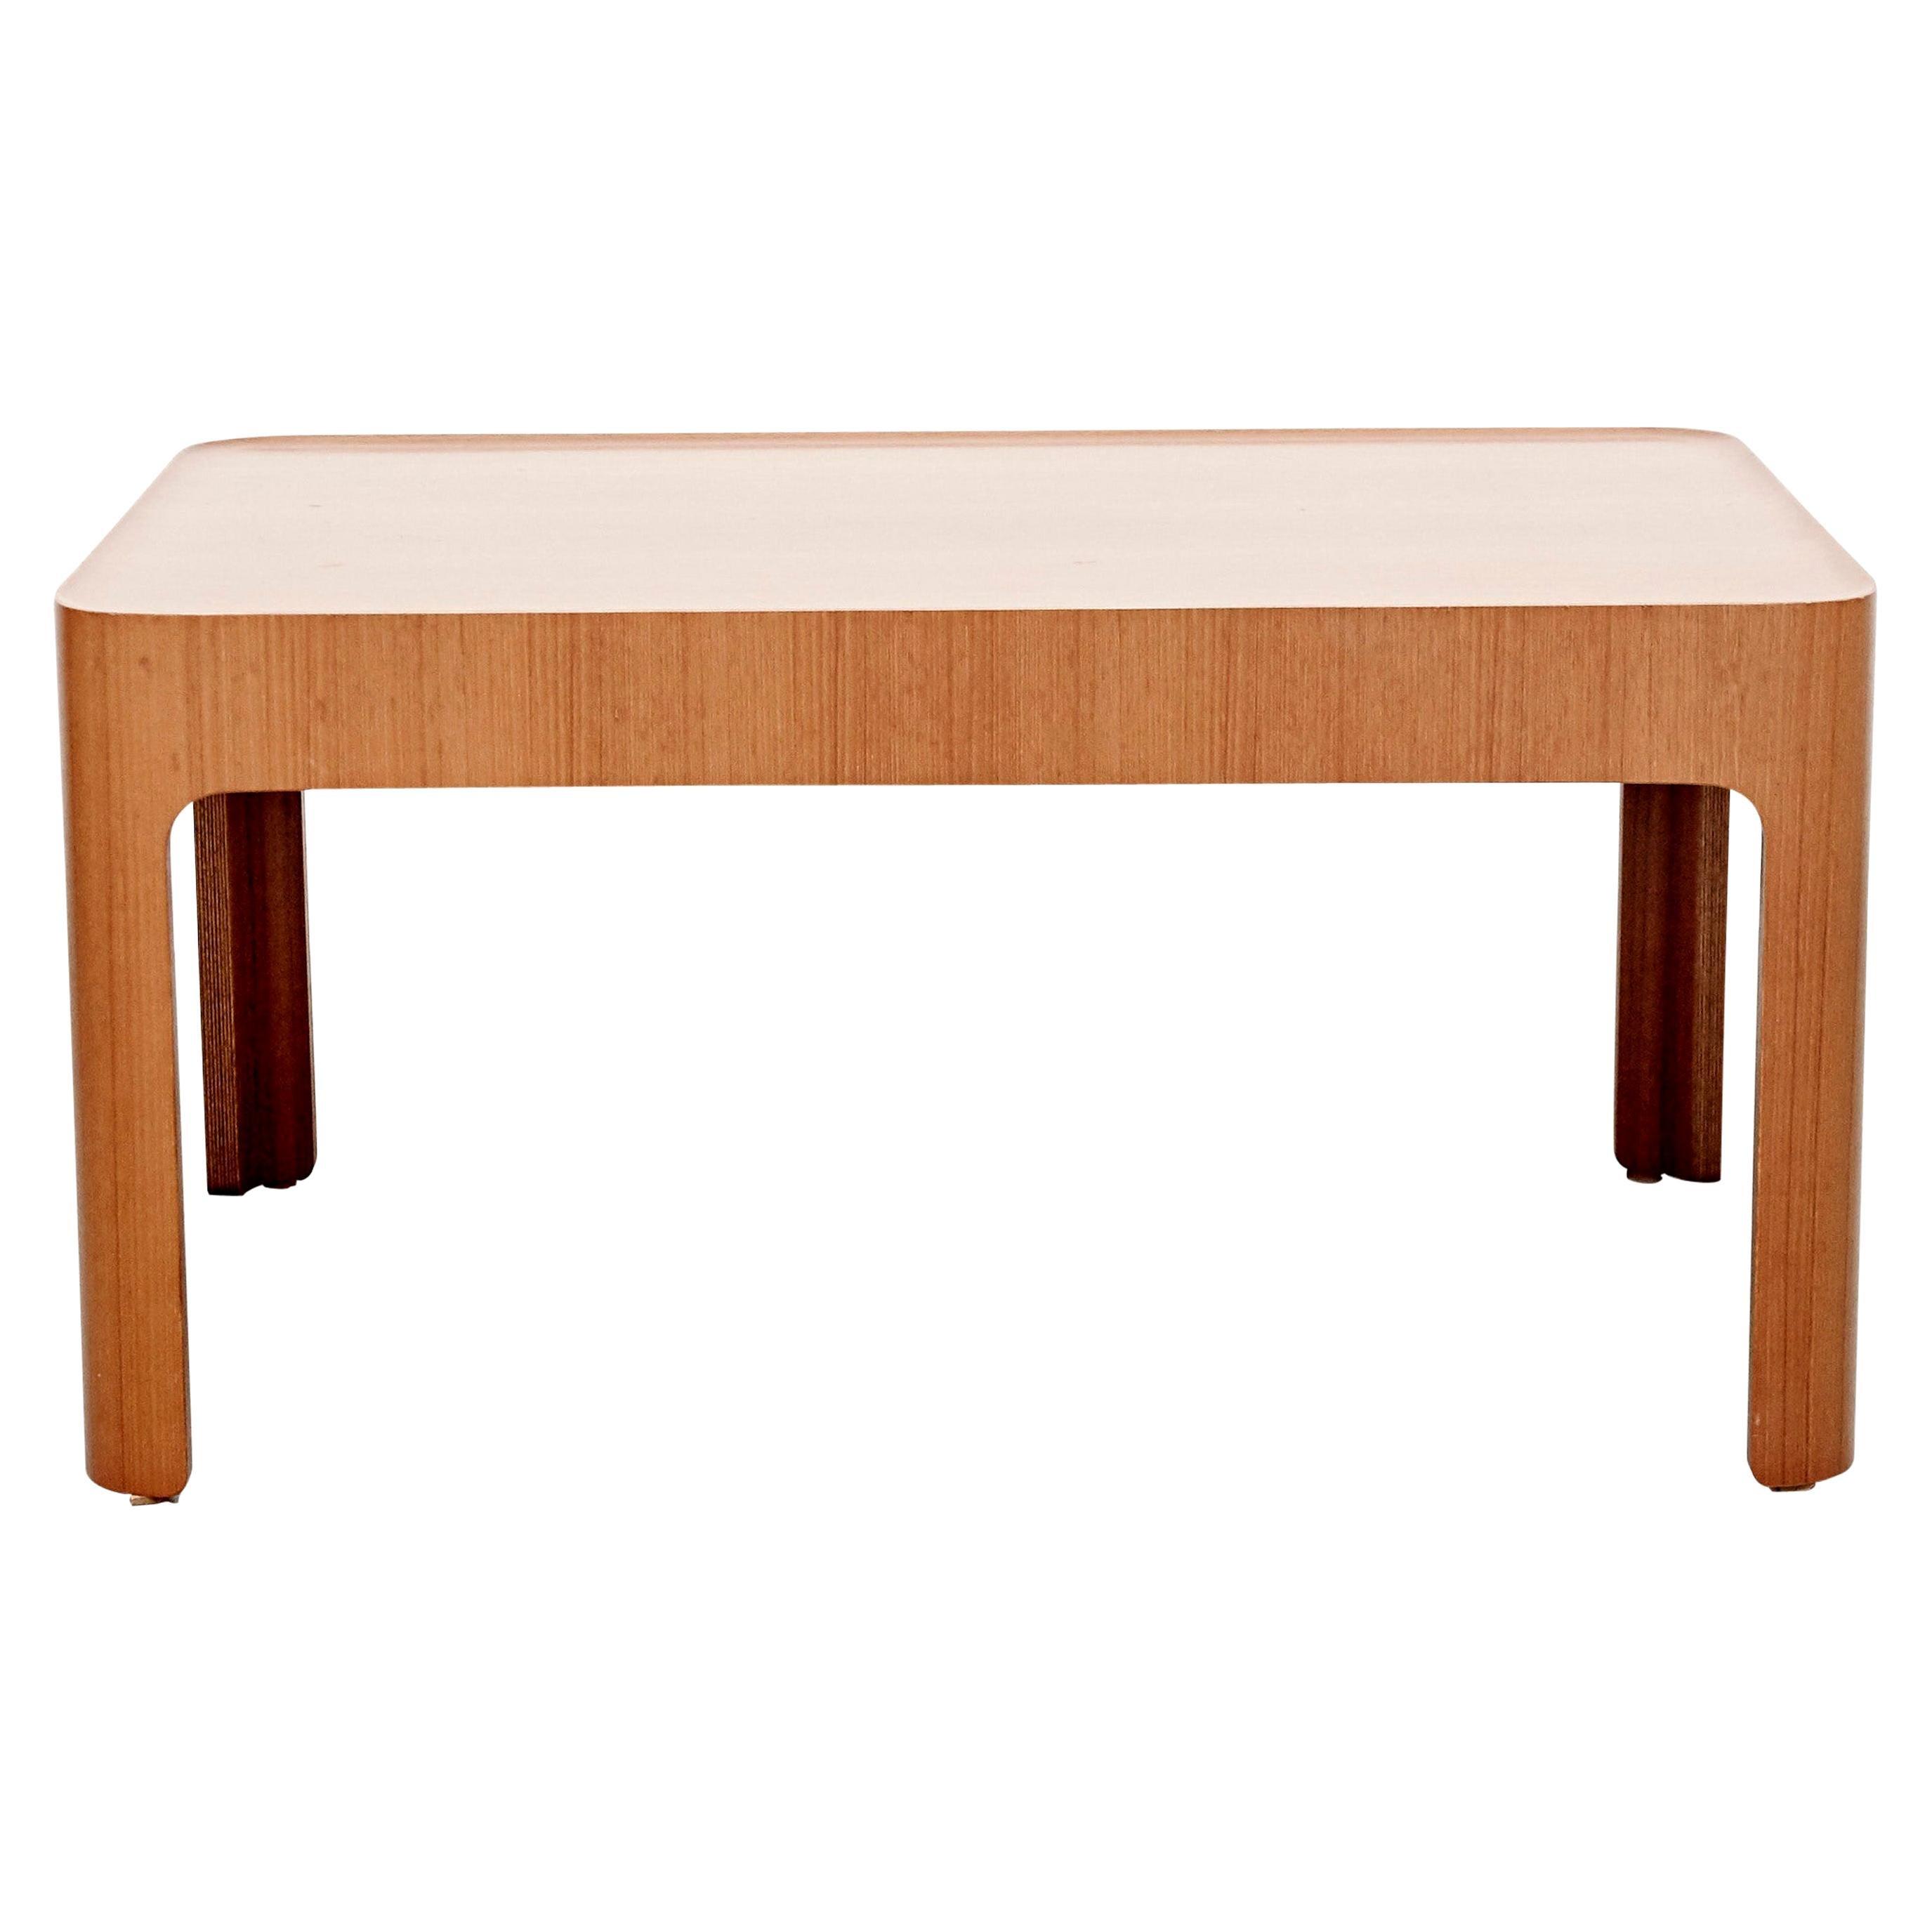 Isamu Kenmochi Mid-Century Modern Wood Coffee Table